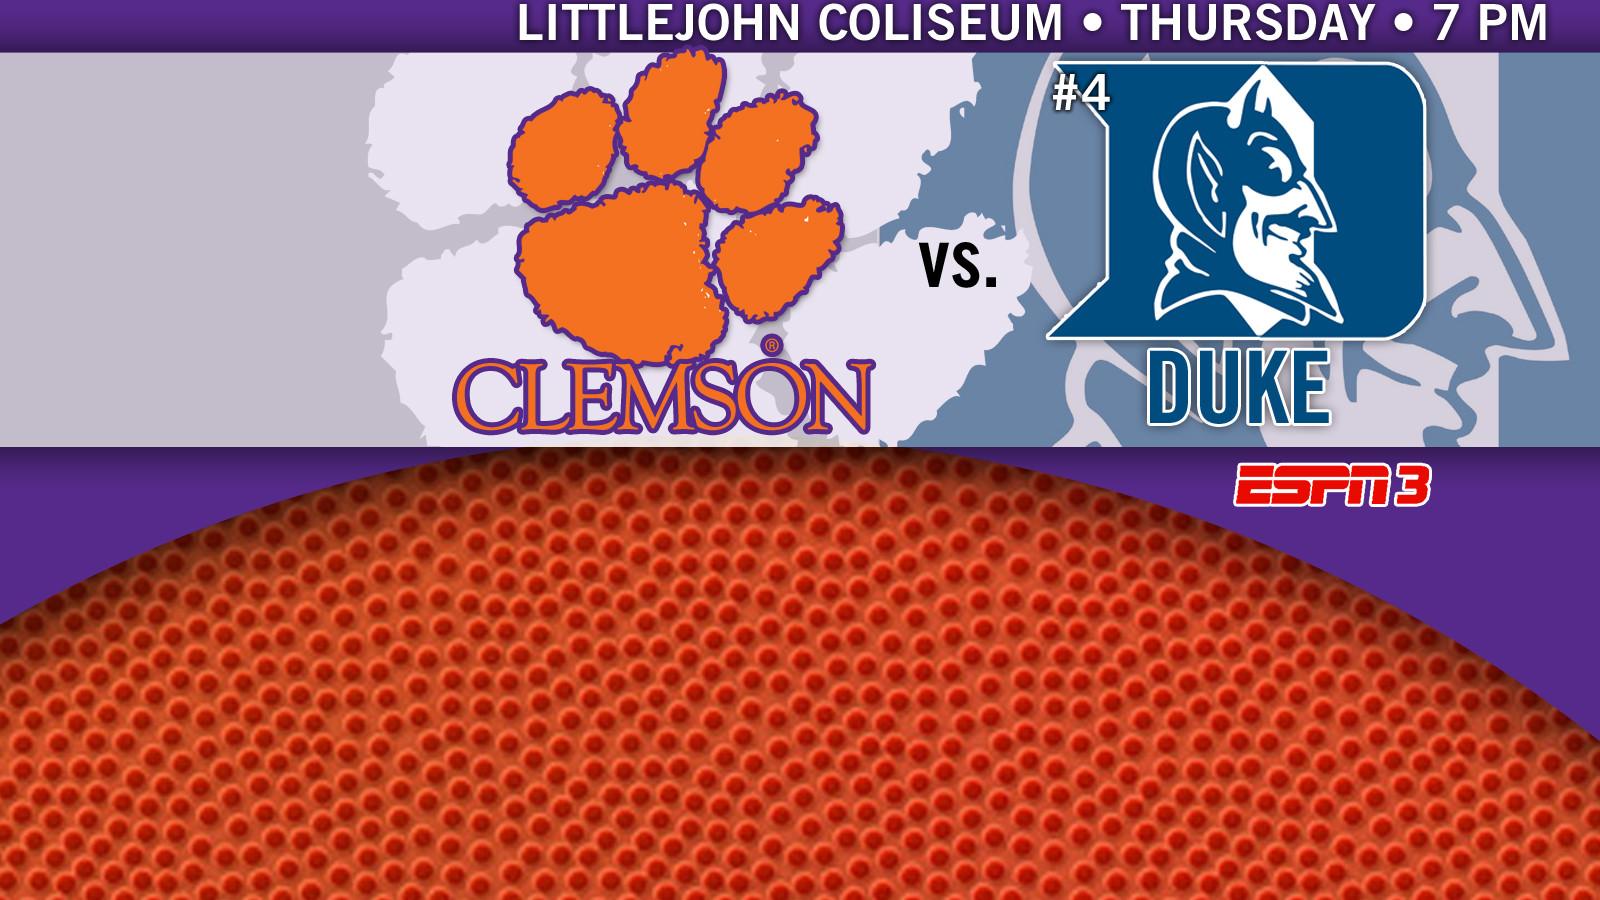 Clemson Plays Host to No. 4 Duke Thursday